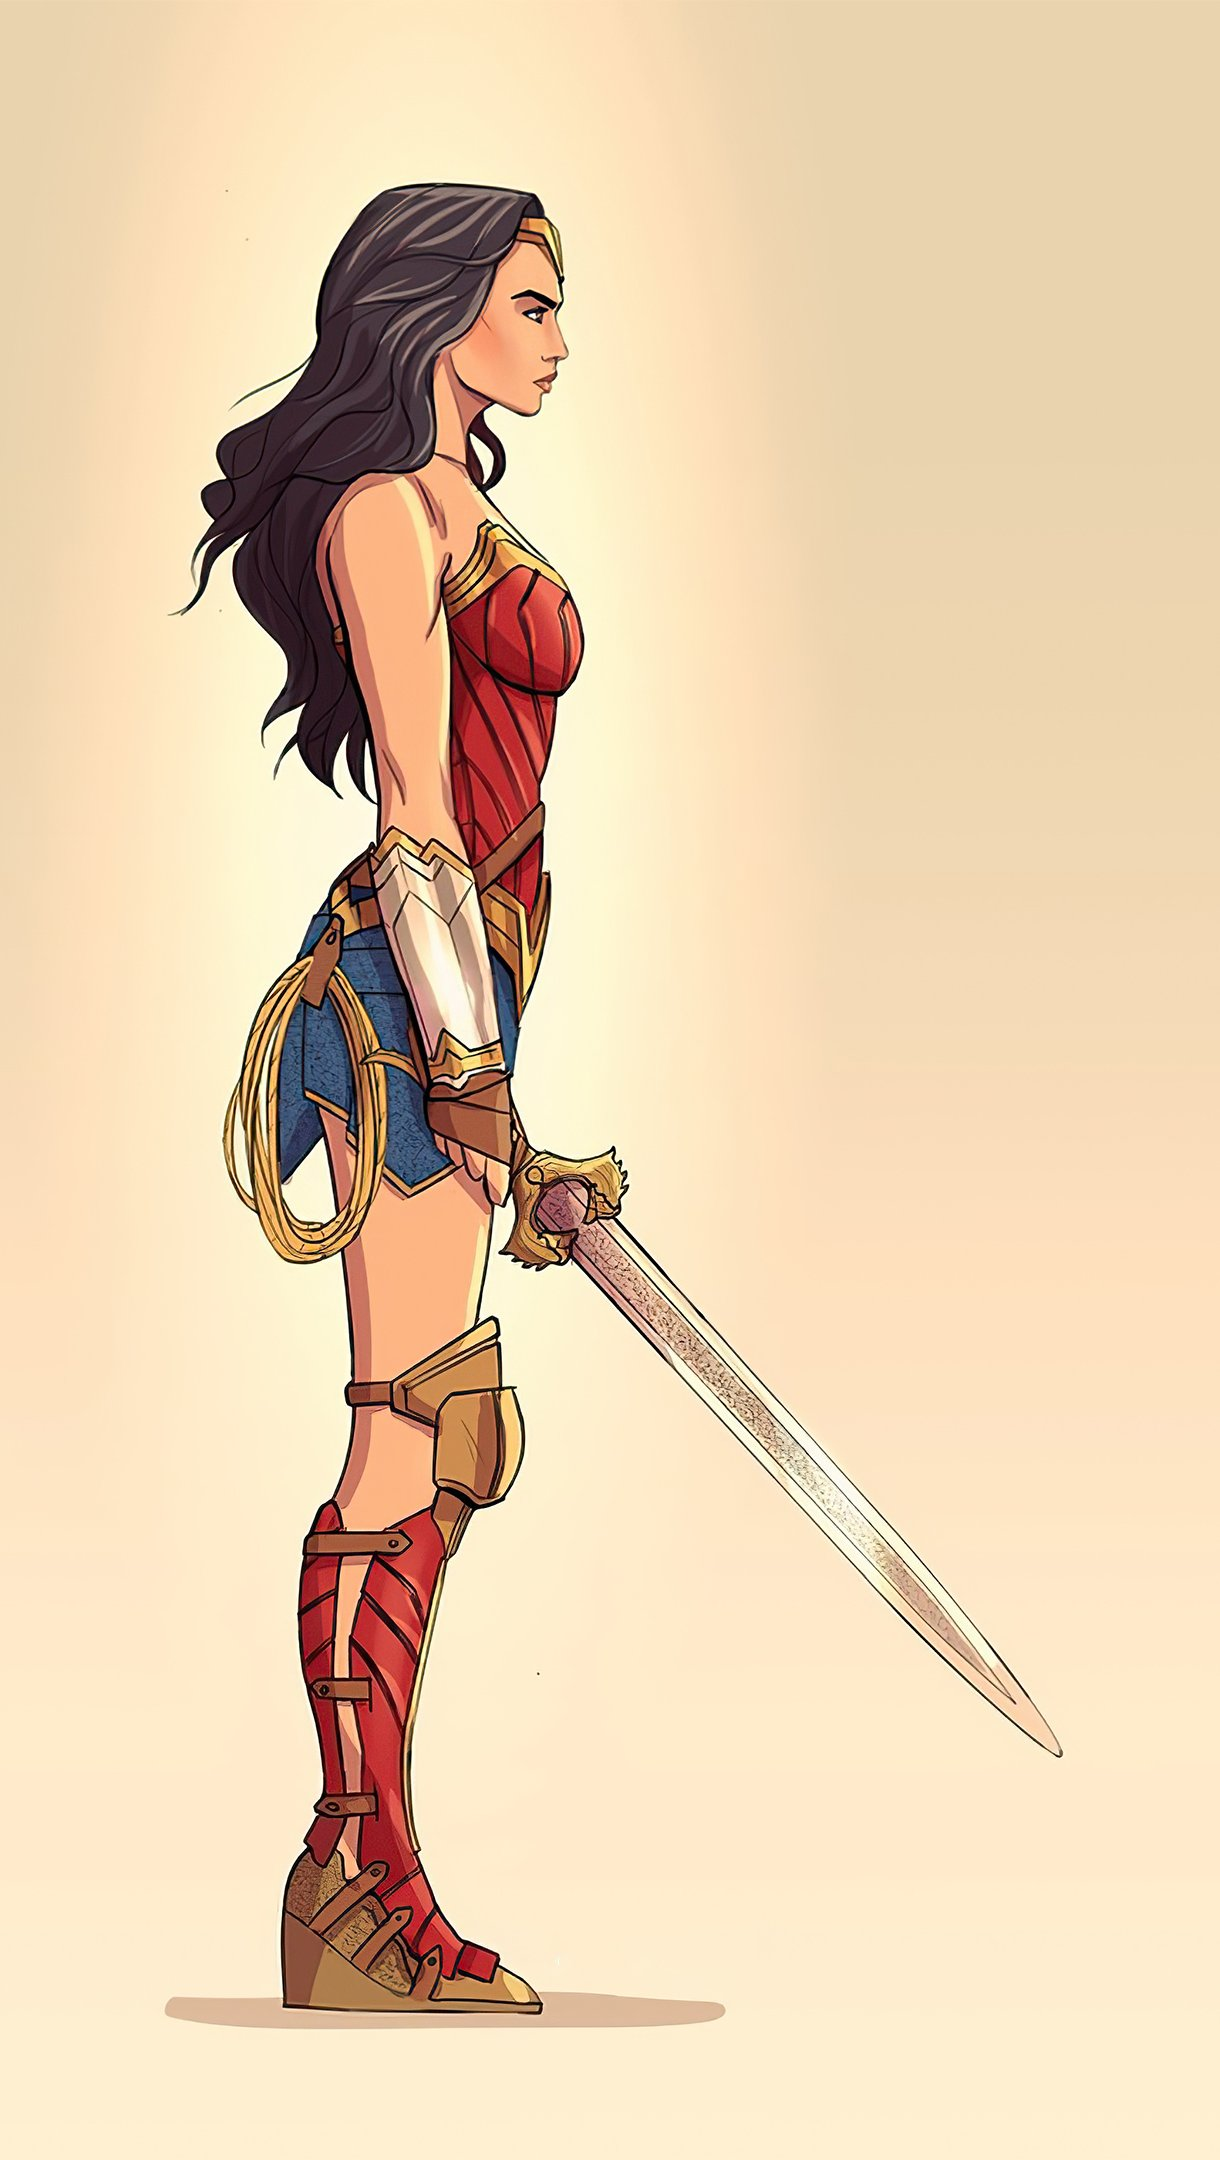 Wallpaper Minimalist Illustration of Wonder Woman Vertical